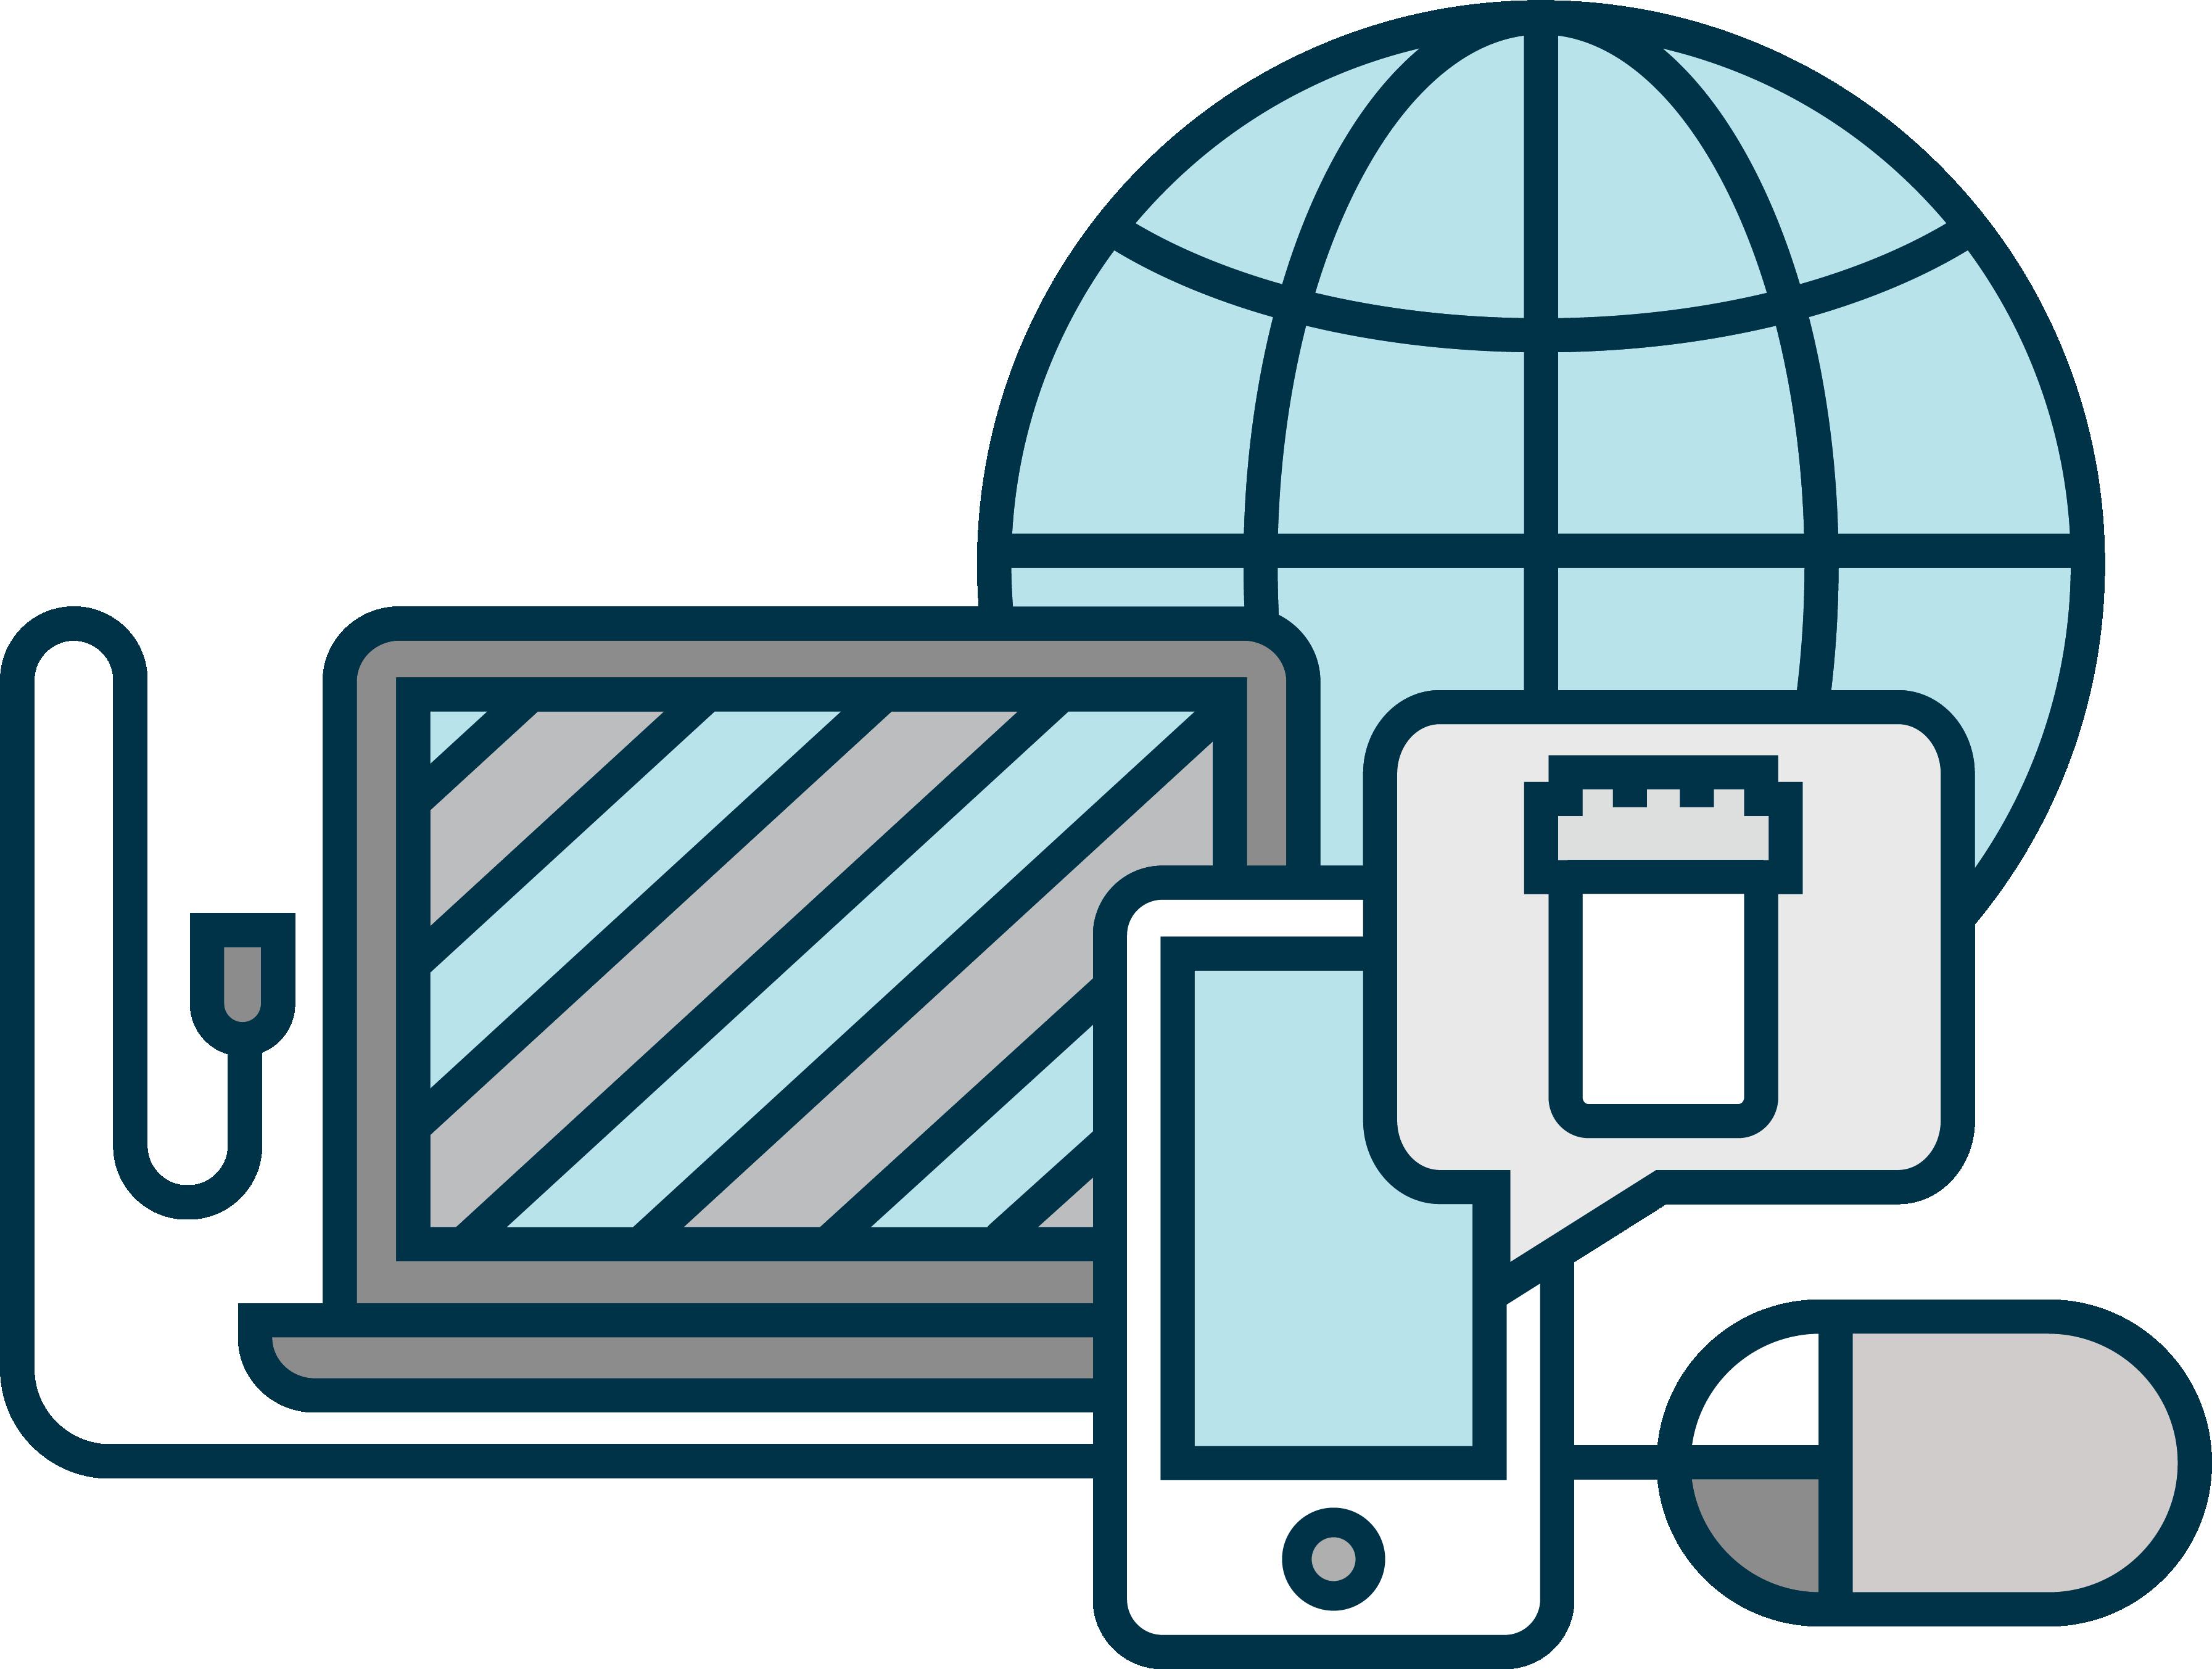 icon clipart technology tech transparent based solutions omnicare advanced applicatie legacy cloud fm website jouw naar d20 cartoon jing transformatie